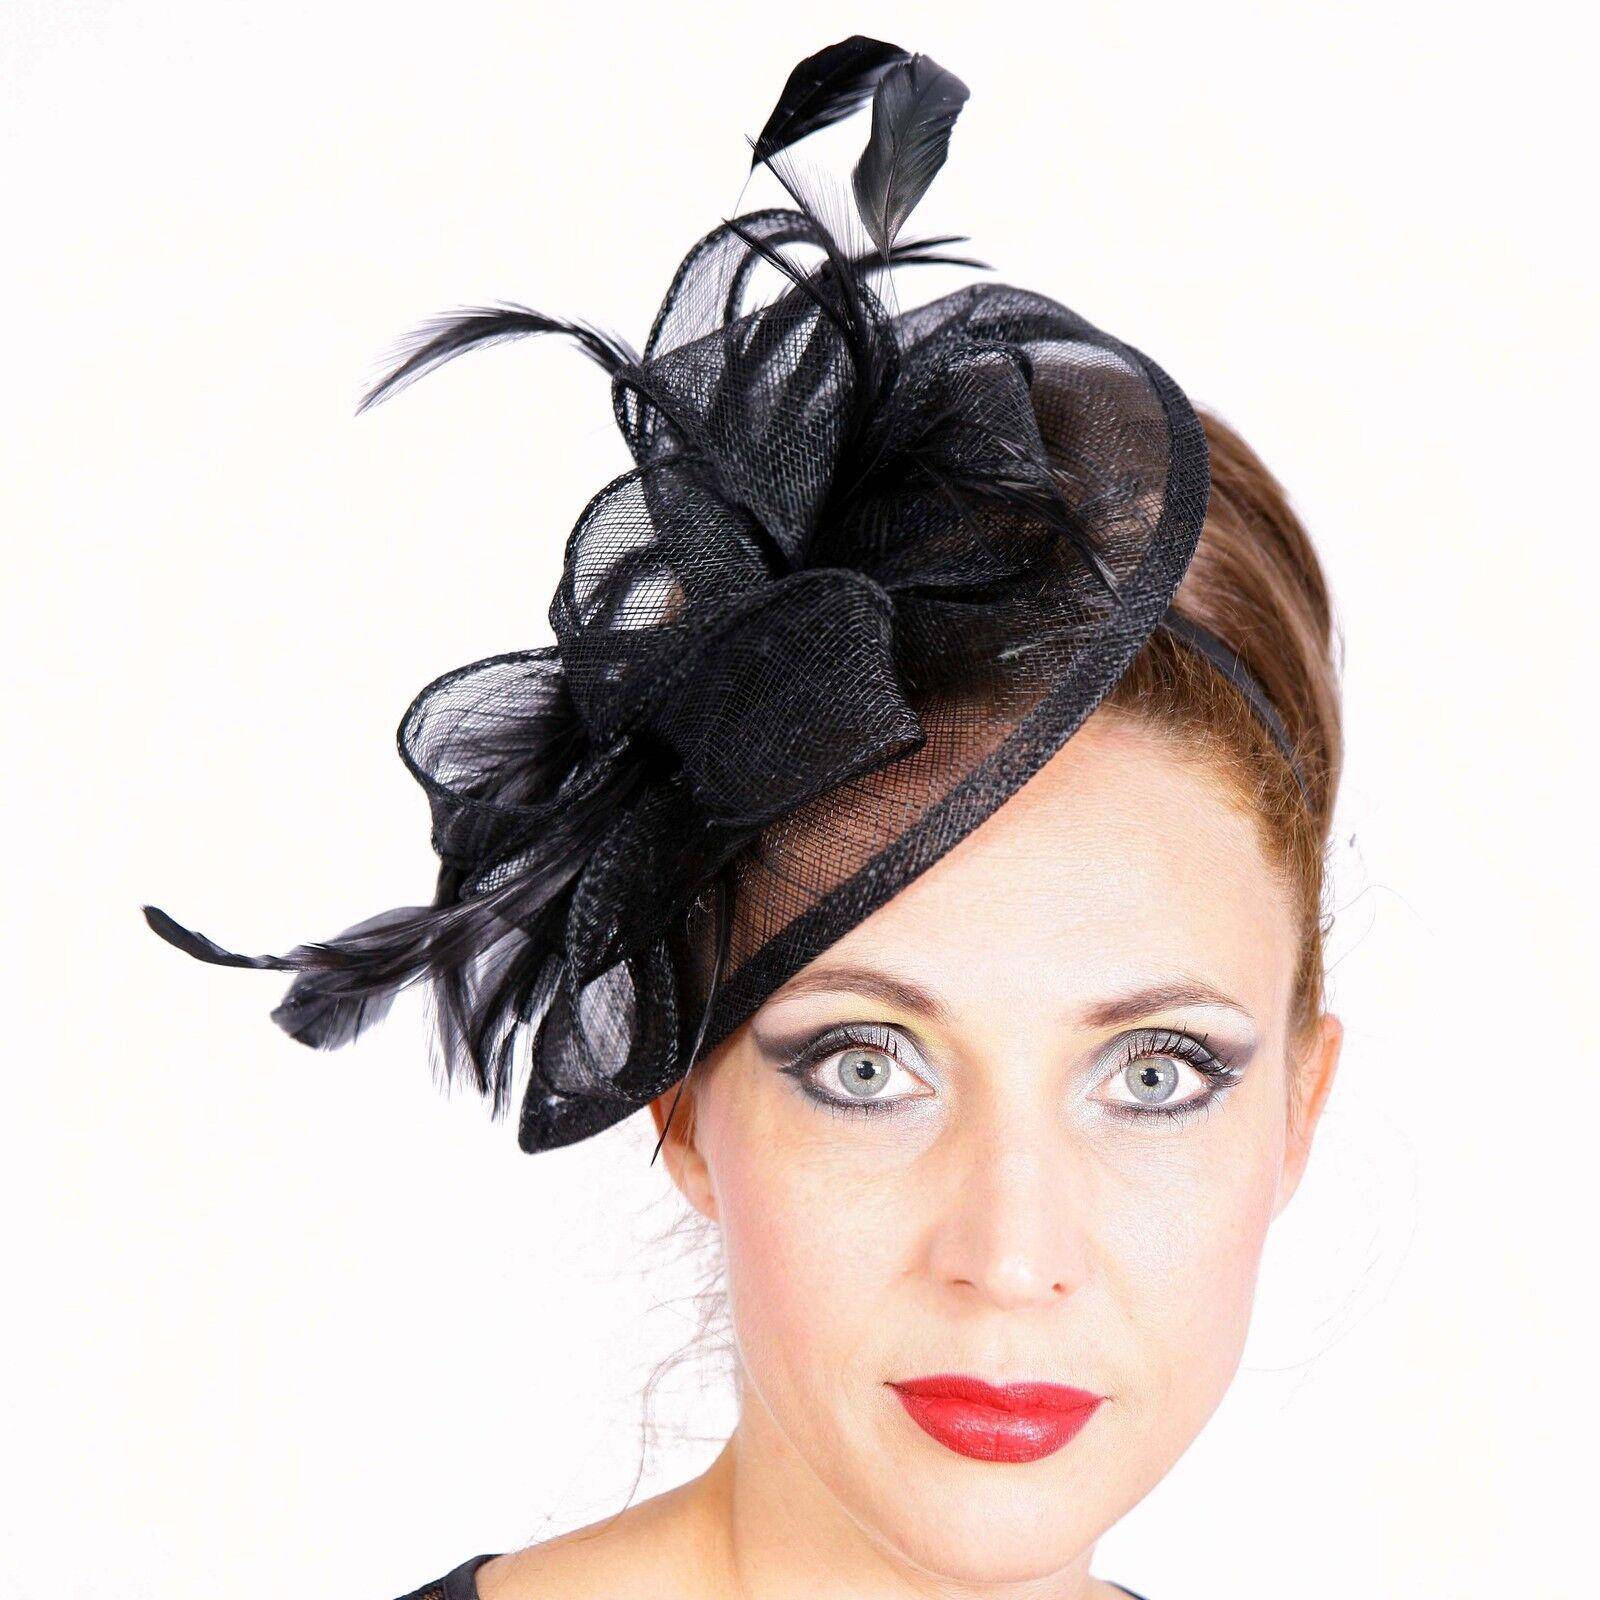 Fascinator Headband Headdress Wedding Elegant Hat Hair Accessories Black New